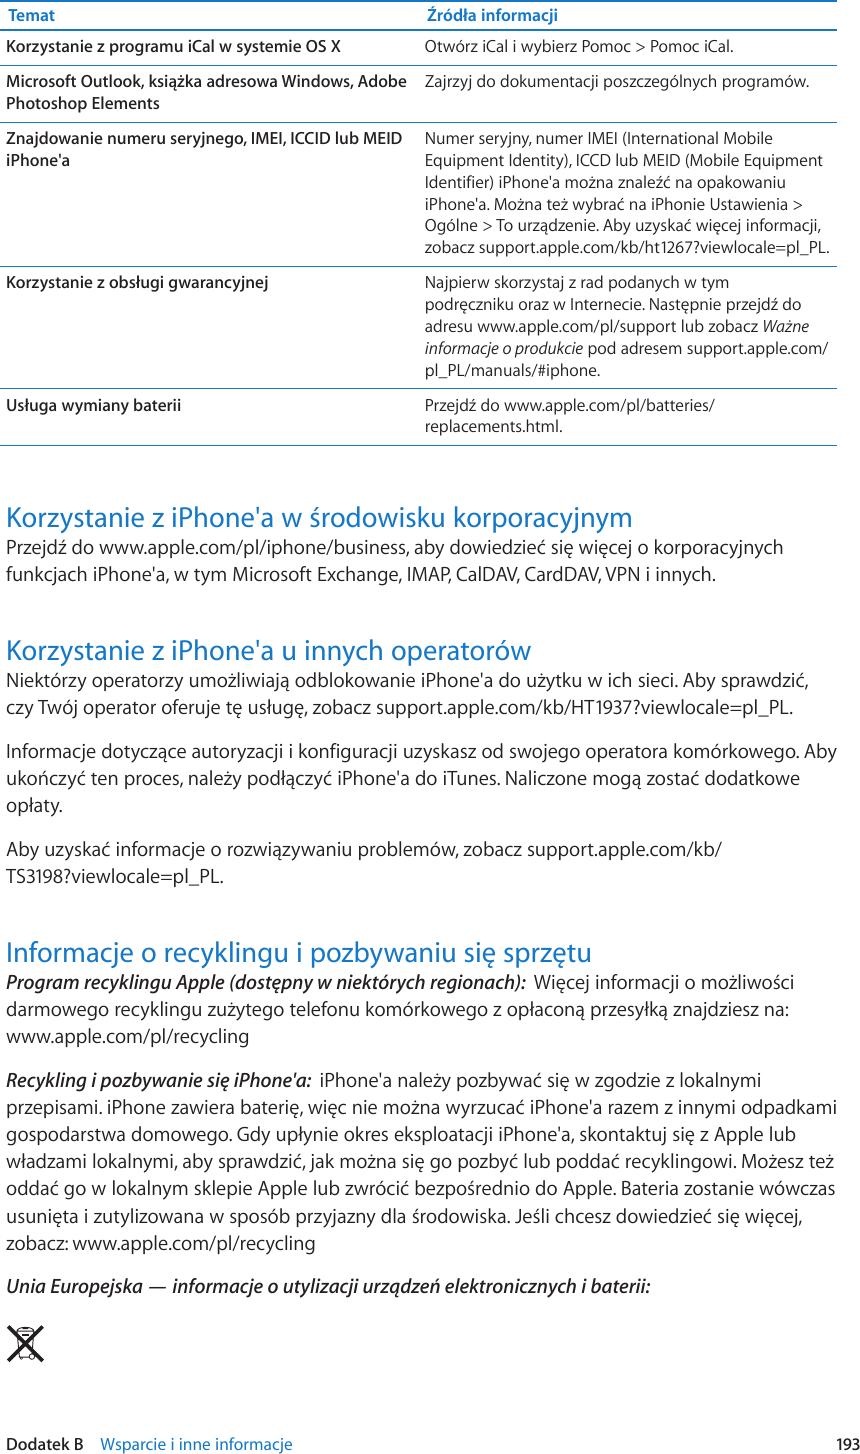 Apple IPhone 3GS Podręcznik Użytkownika User Manual I Phone